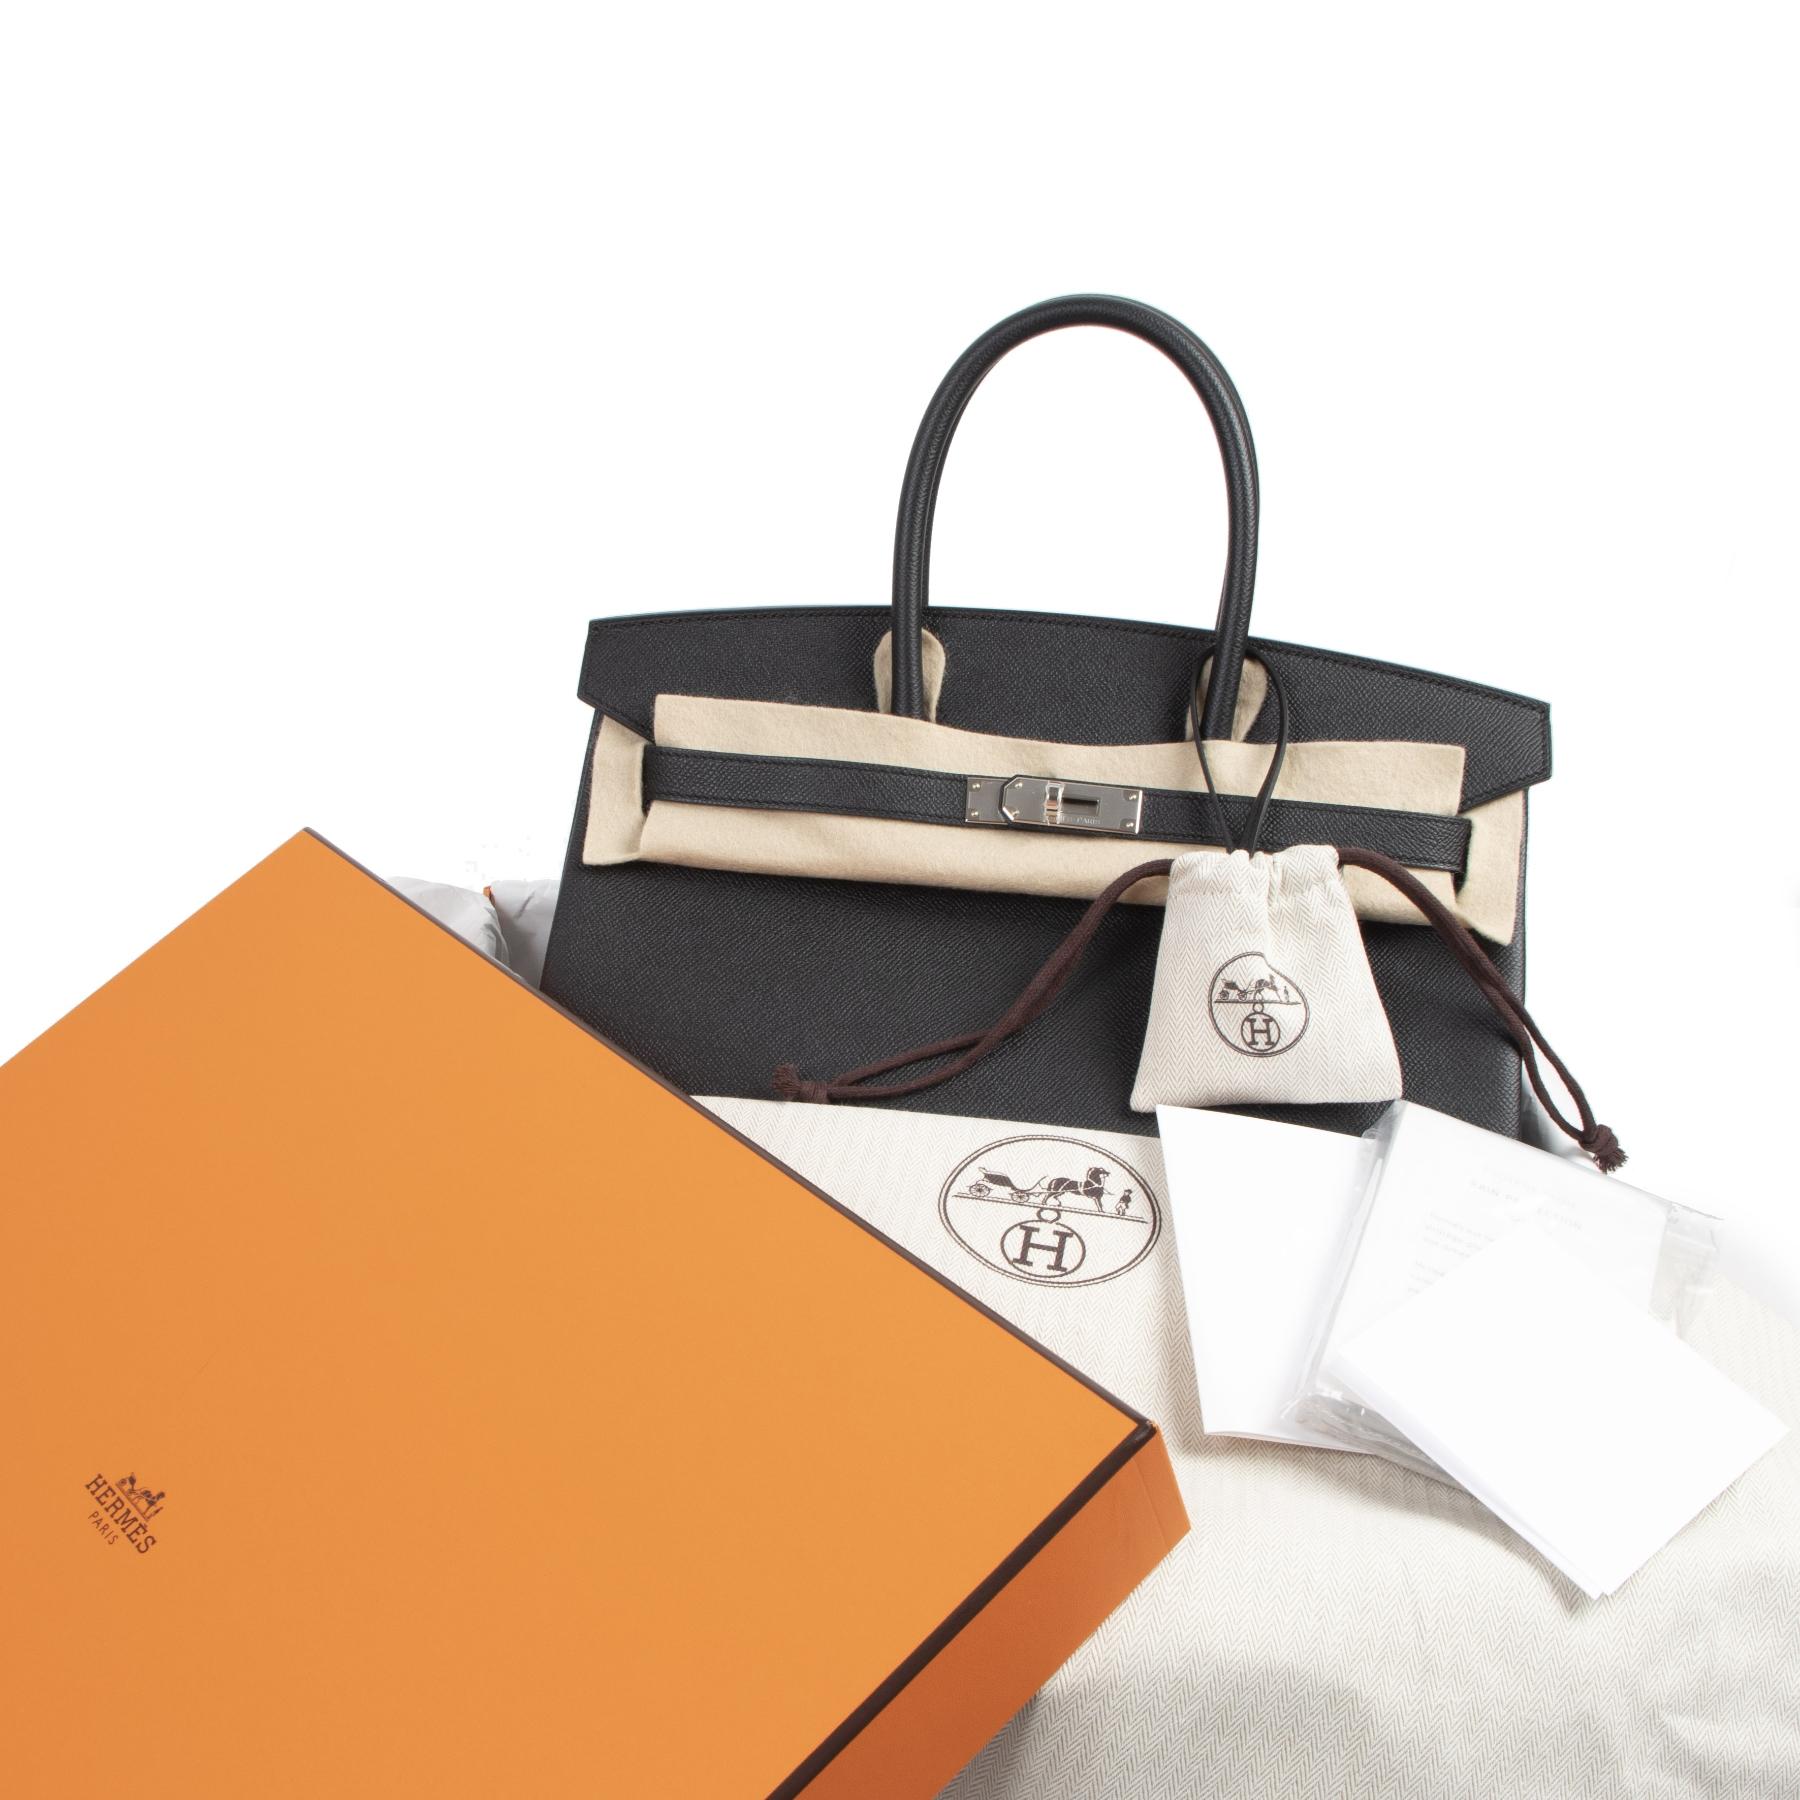 Authentic second-hand vintage Hermès Birkin 35 Black Epsom PHW buy online webshop LabelLOV